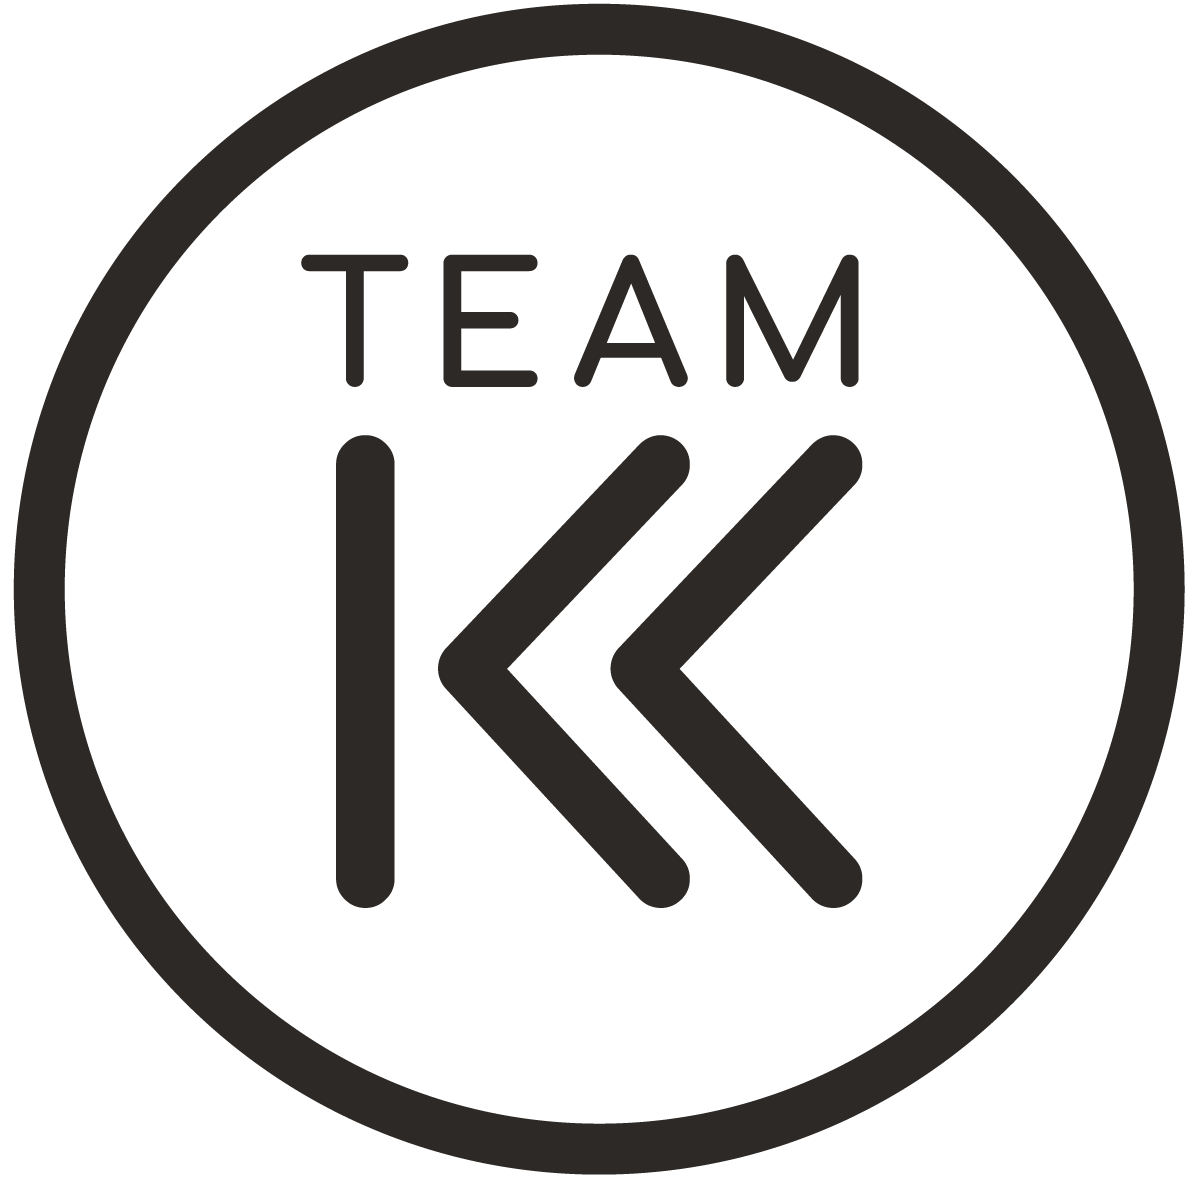 Team KK